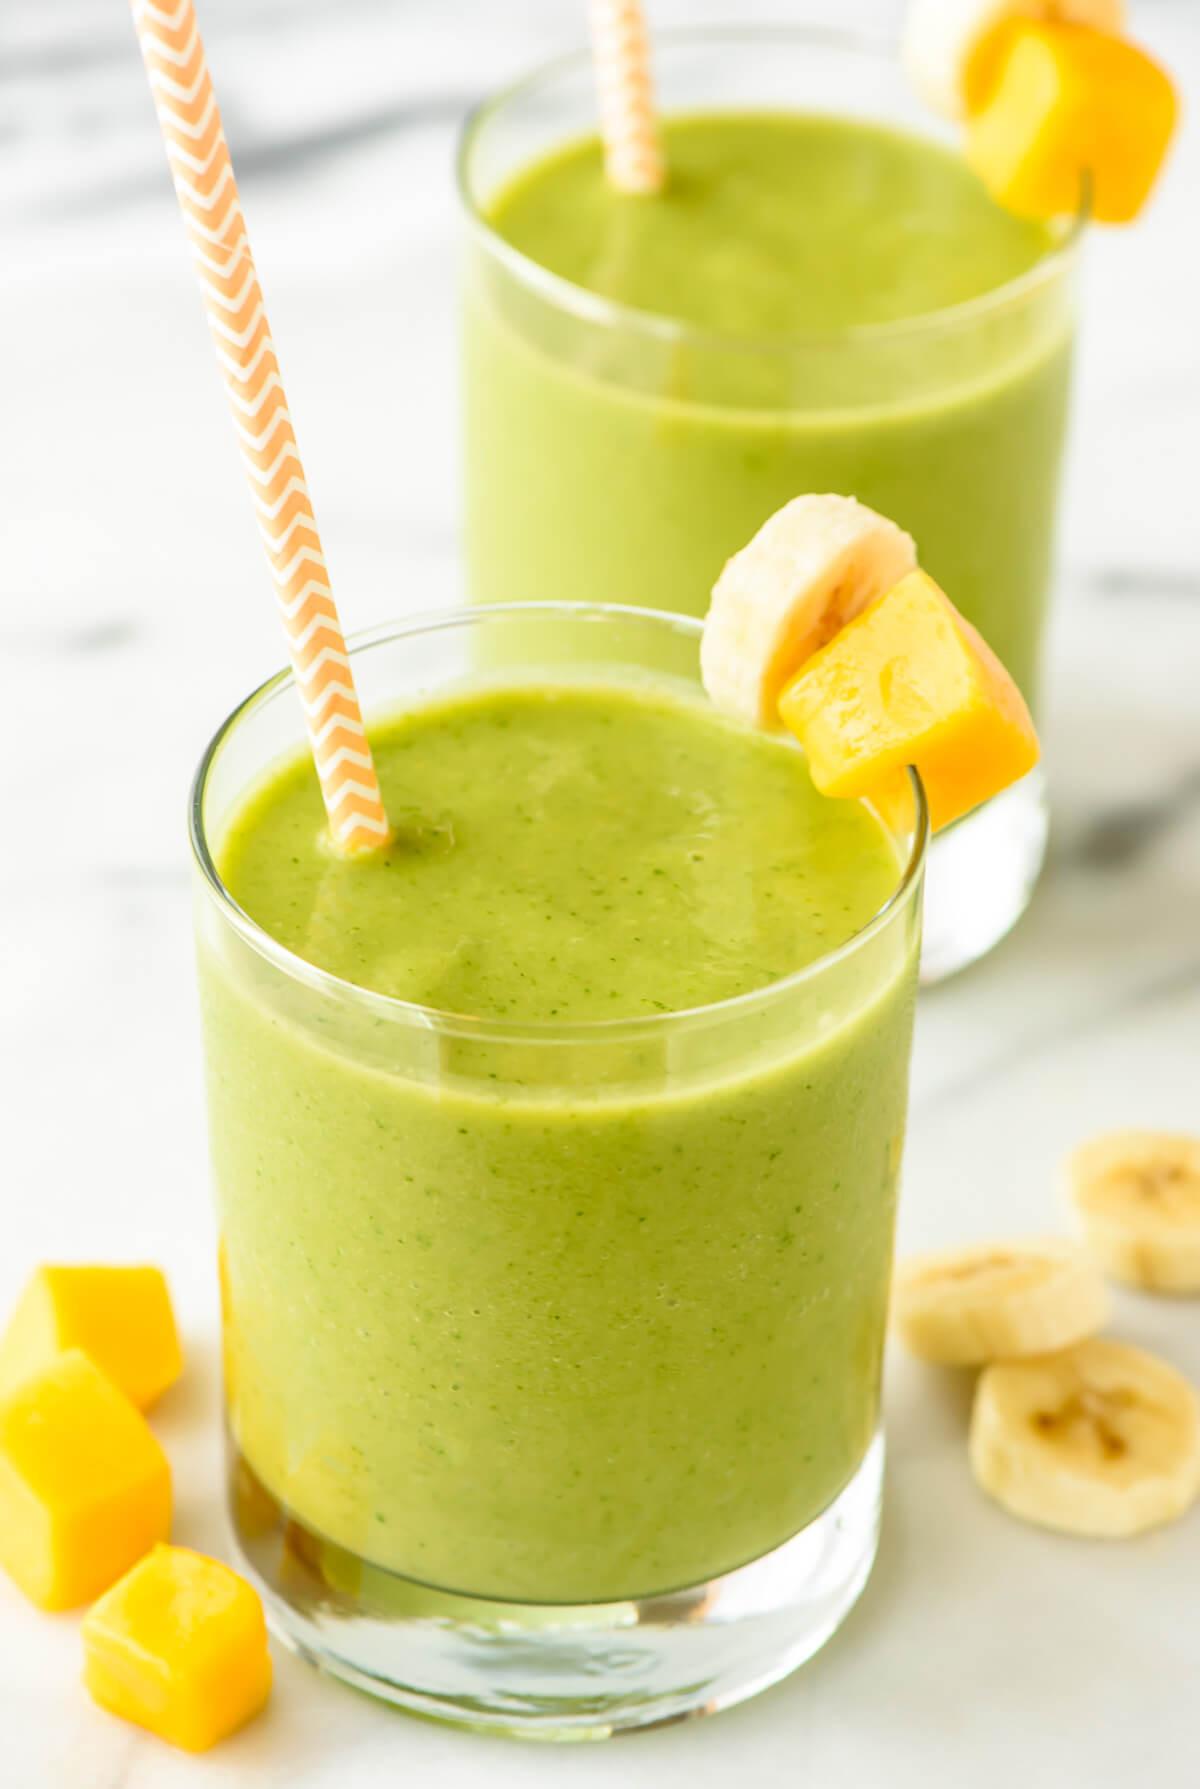 Healthy Mango Recipes  10 Best Mango Smoothie Recipes Healthy Mango Smoothies